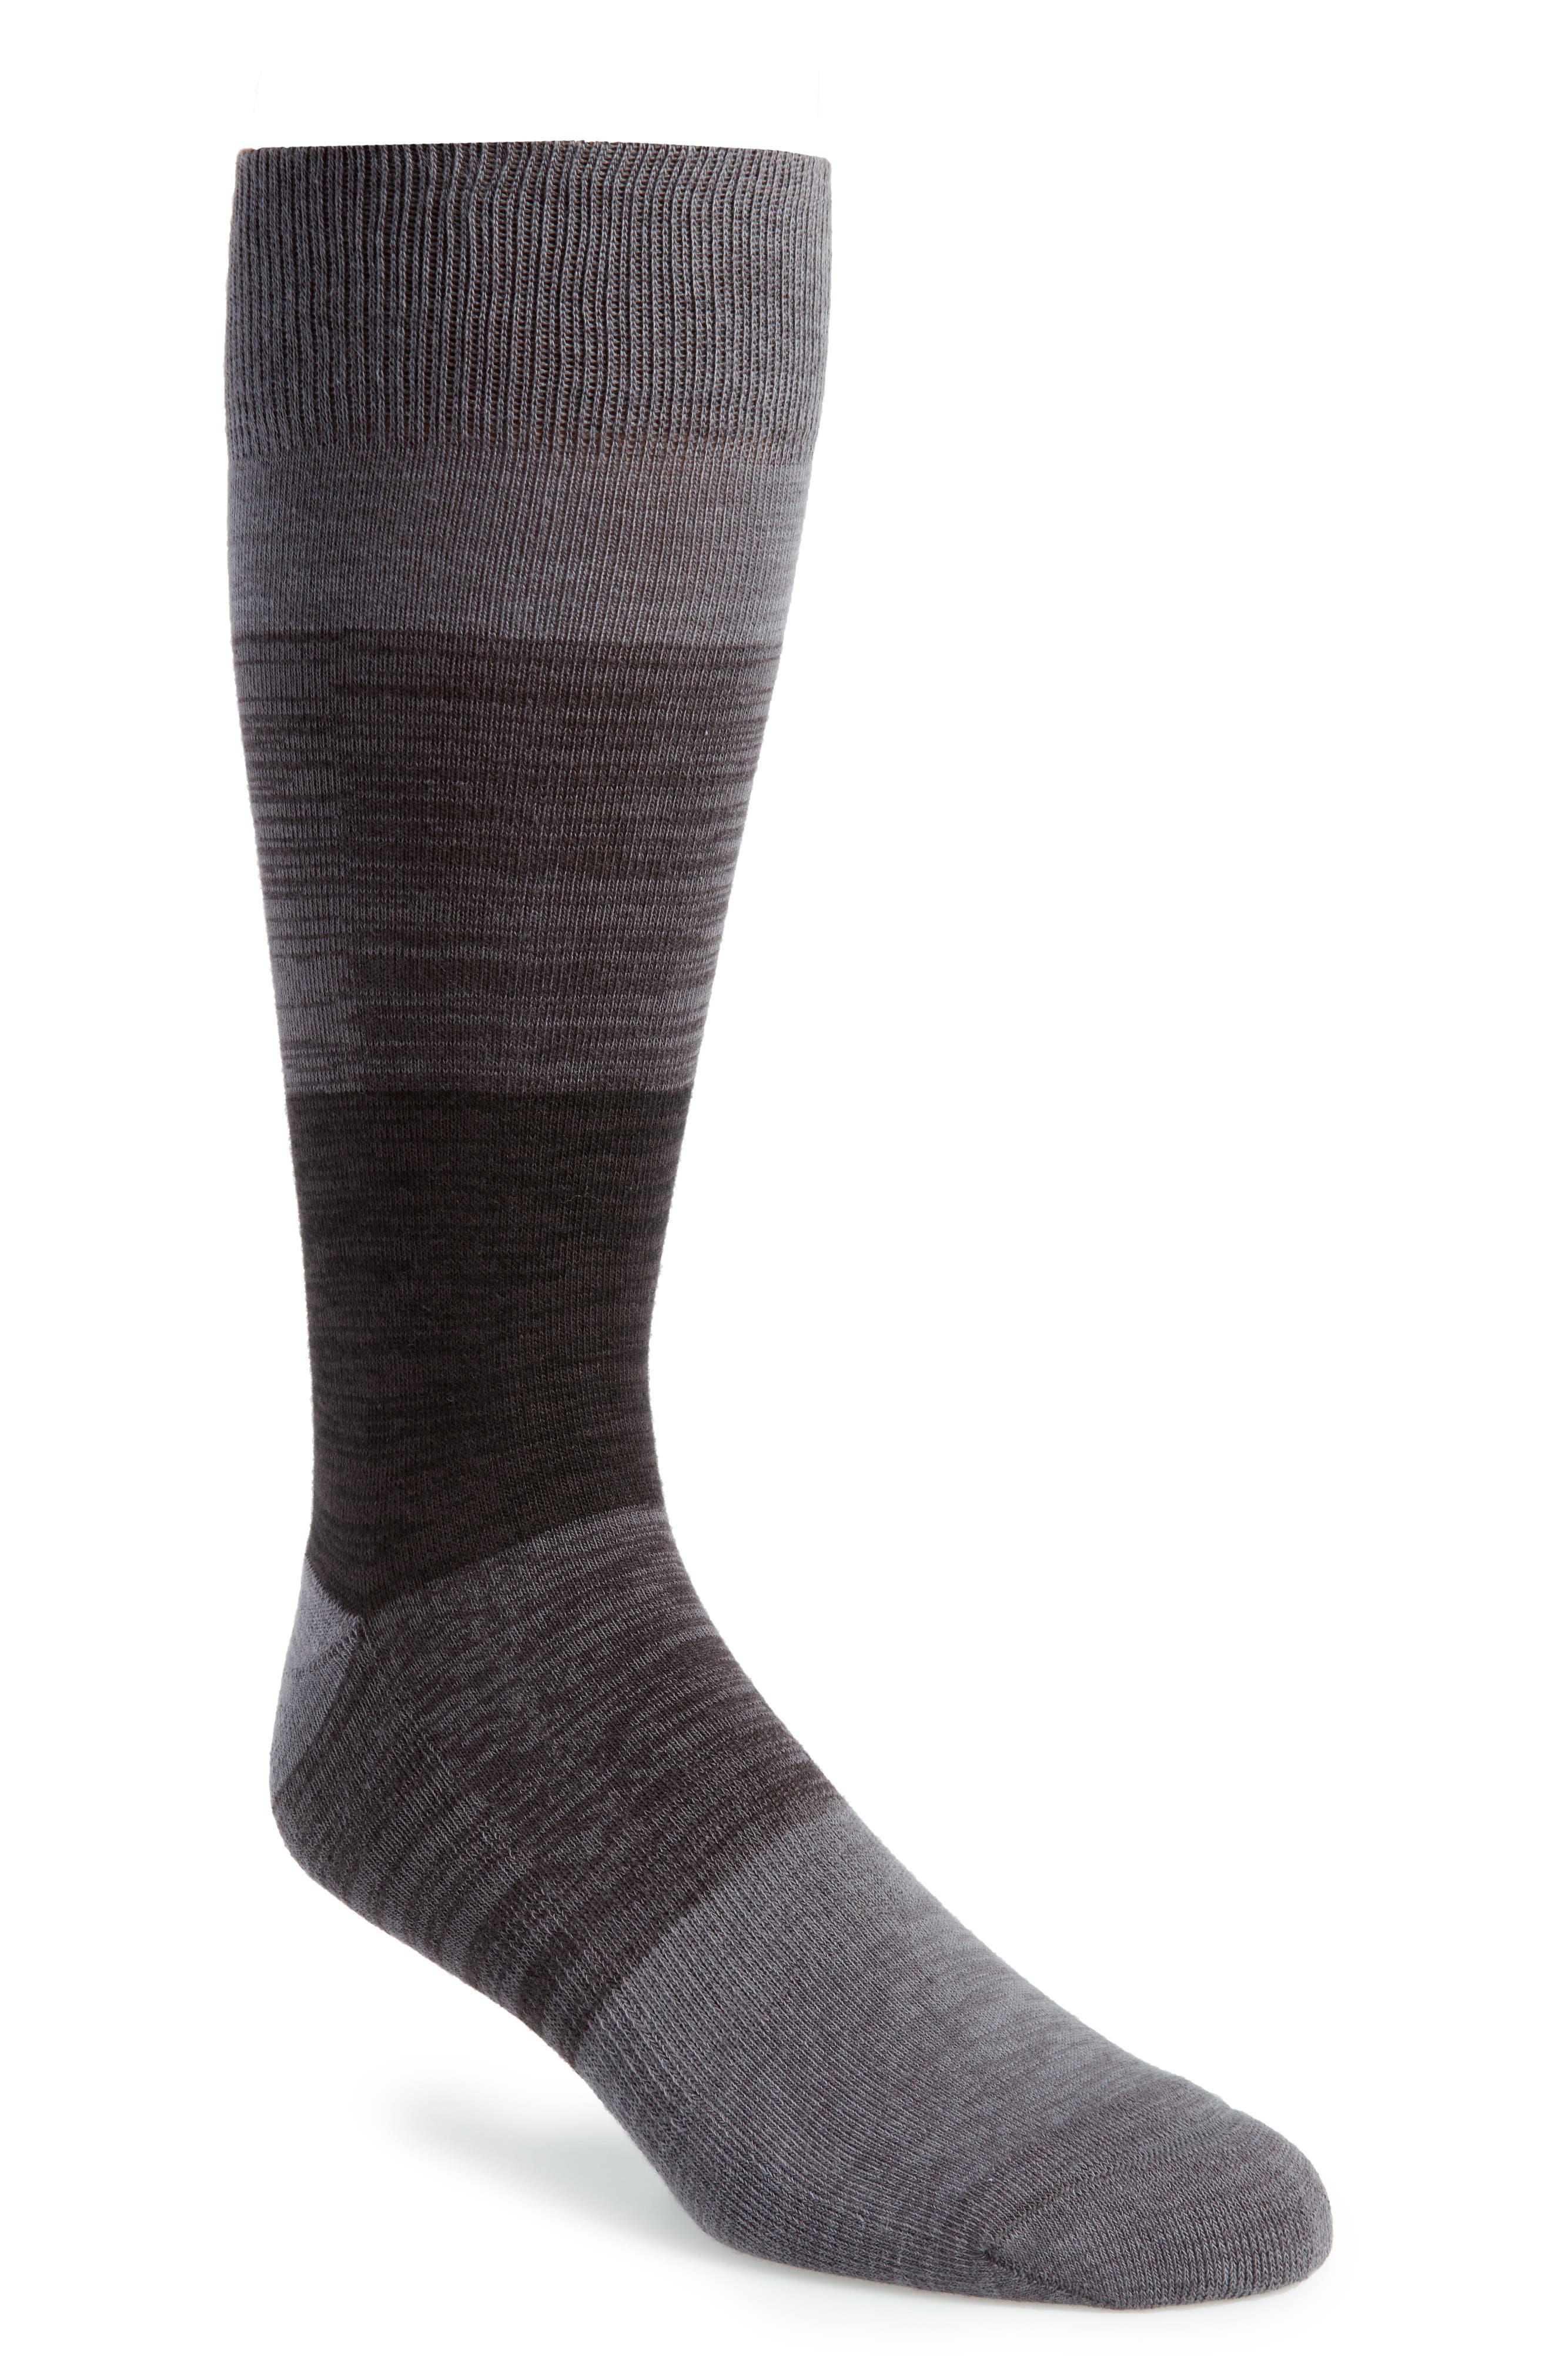 Nordstrom Men's Shop Free Run Gradient Crew Socks